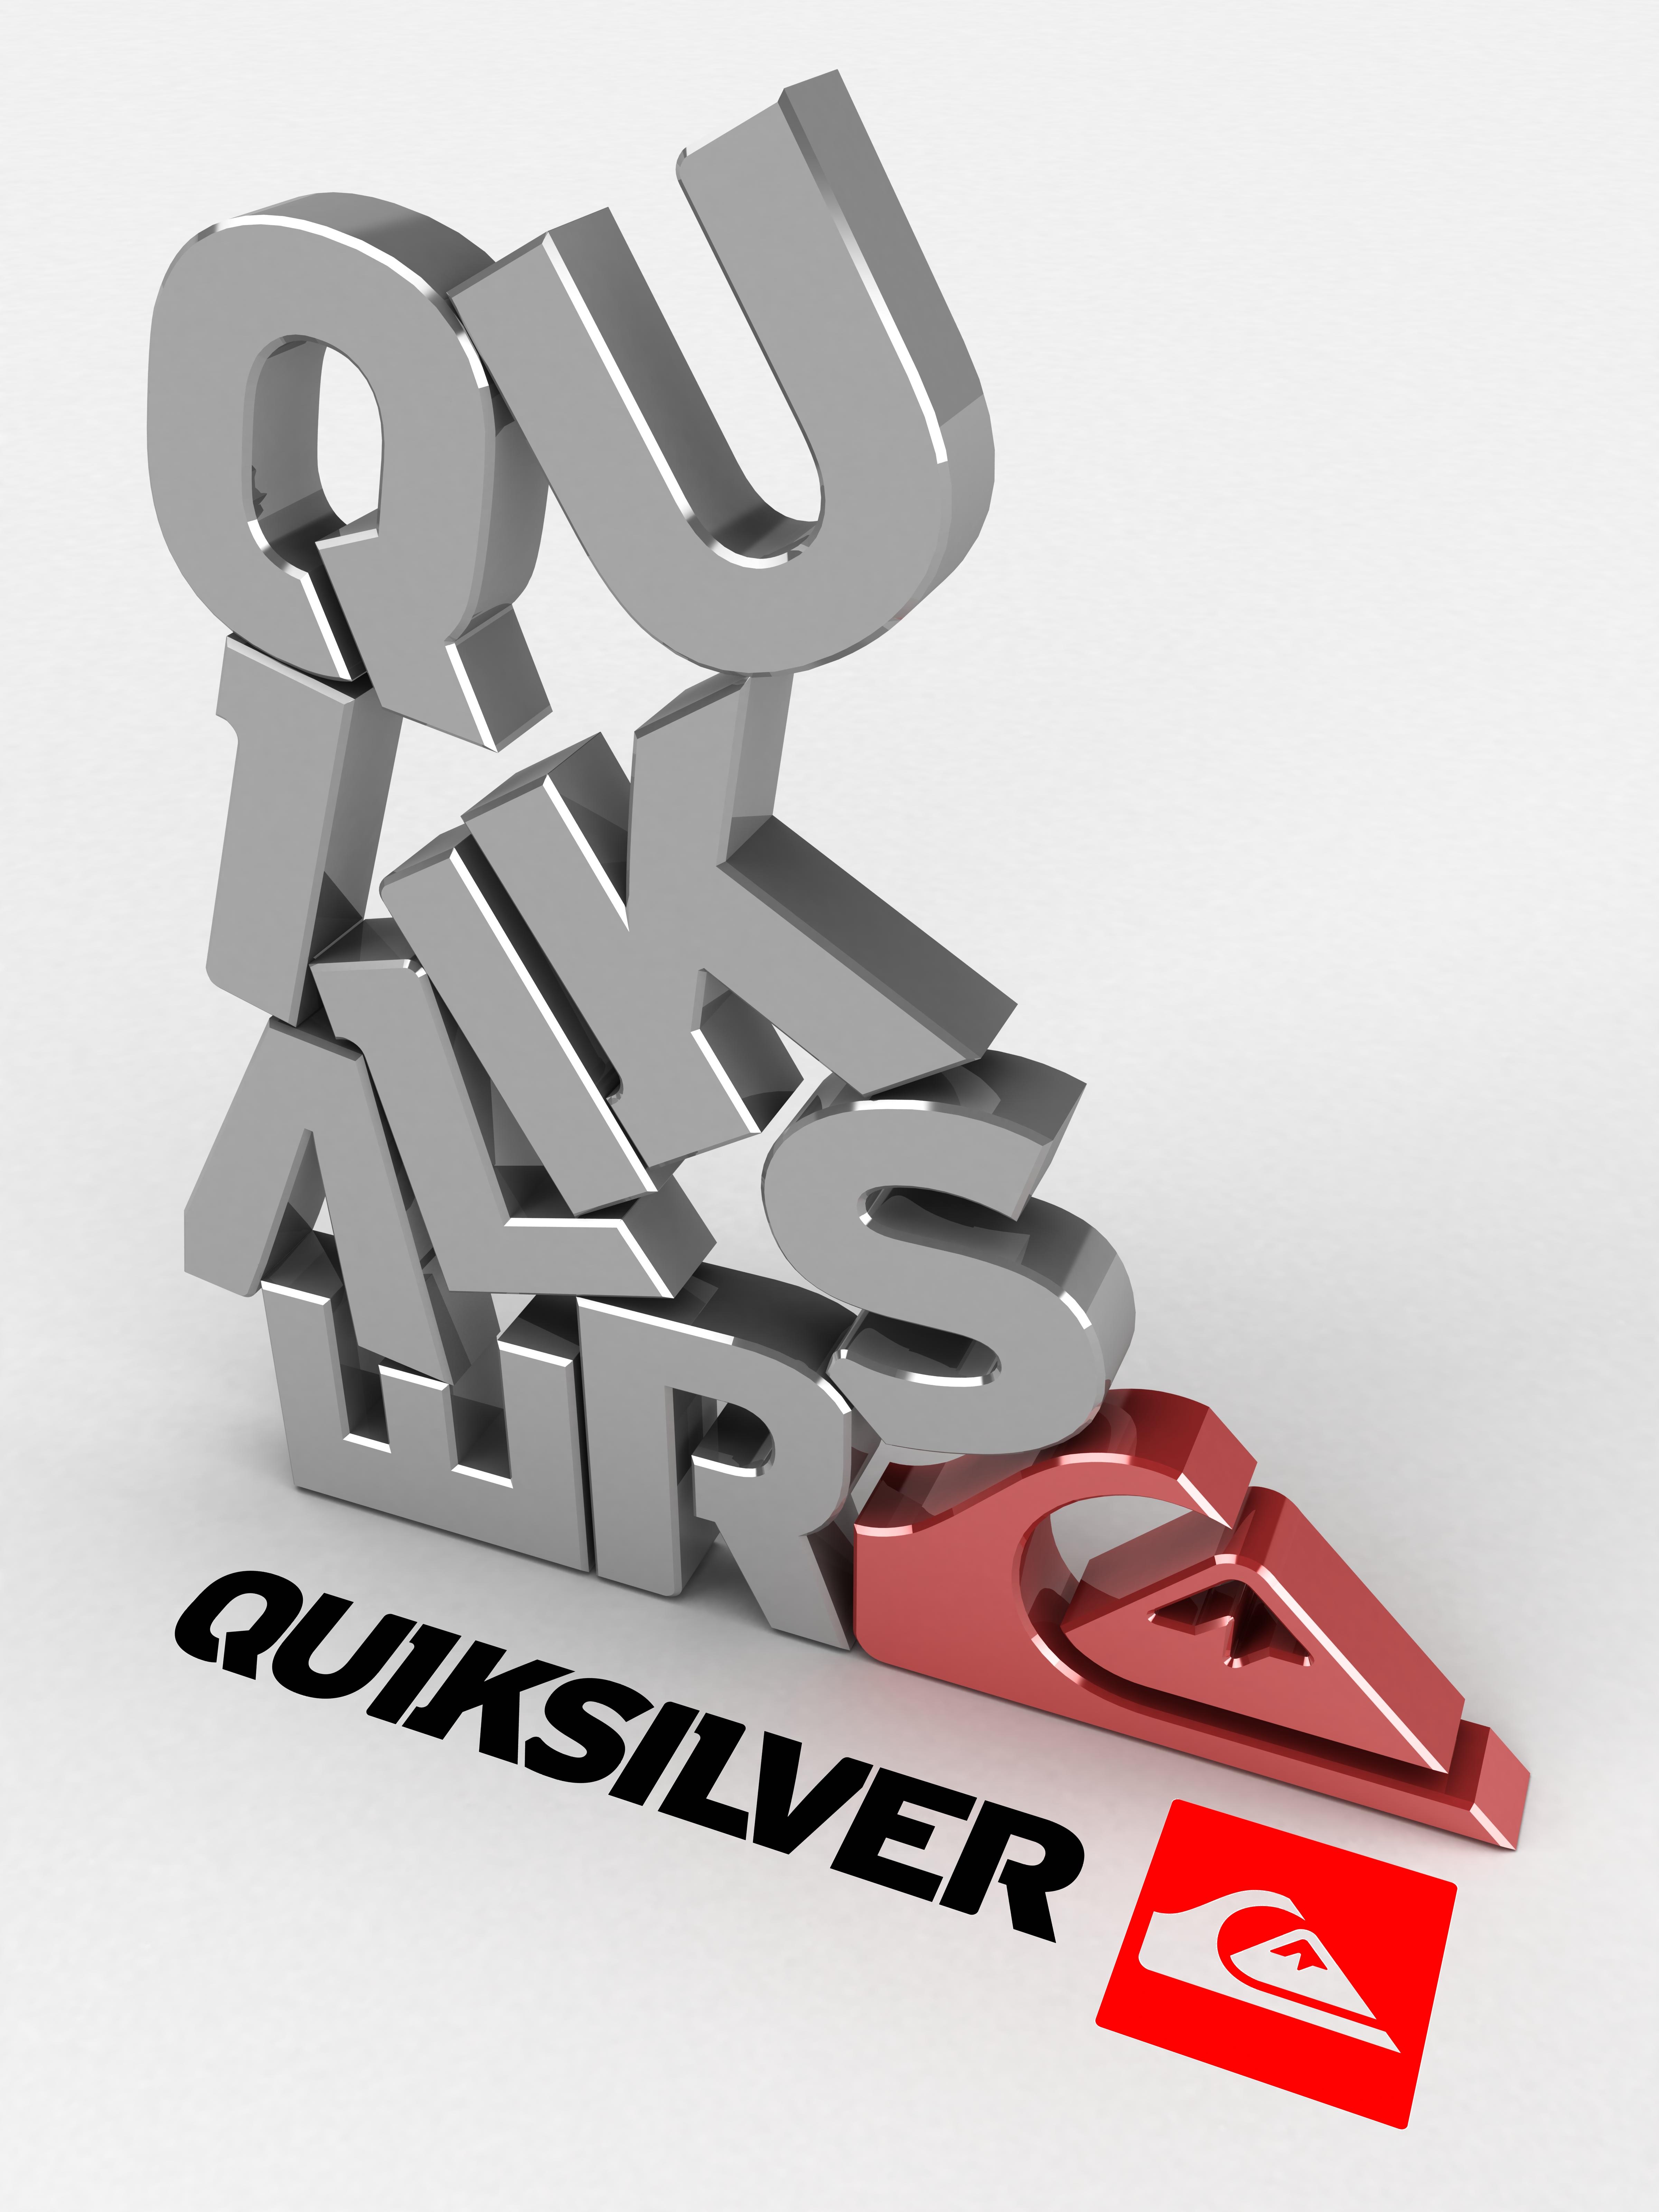 QUIKSILVER By RADiCALcz 4800x6400